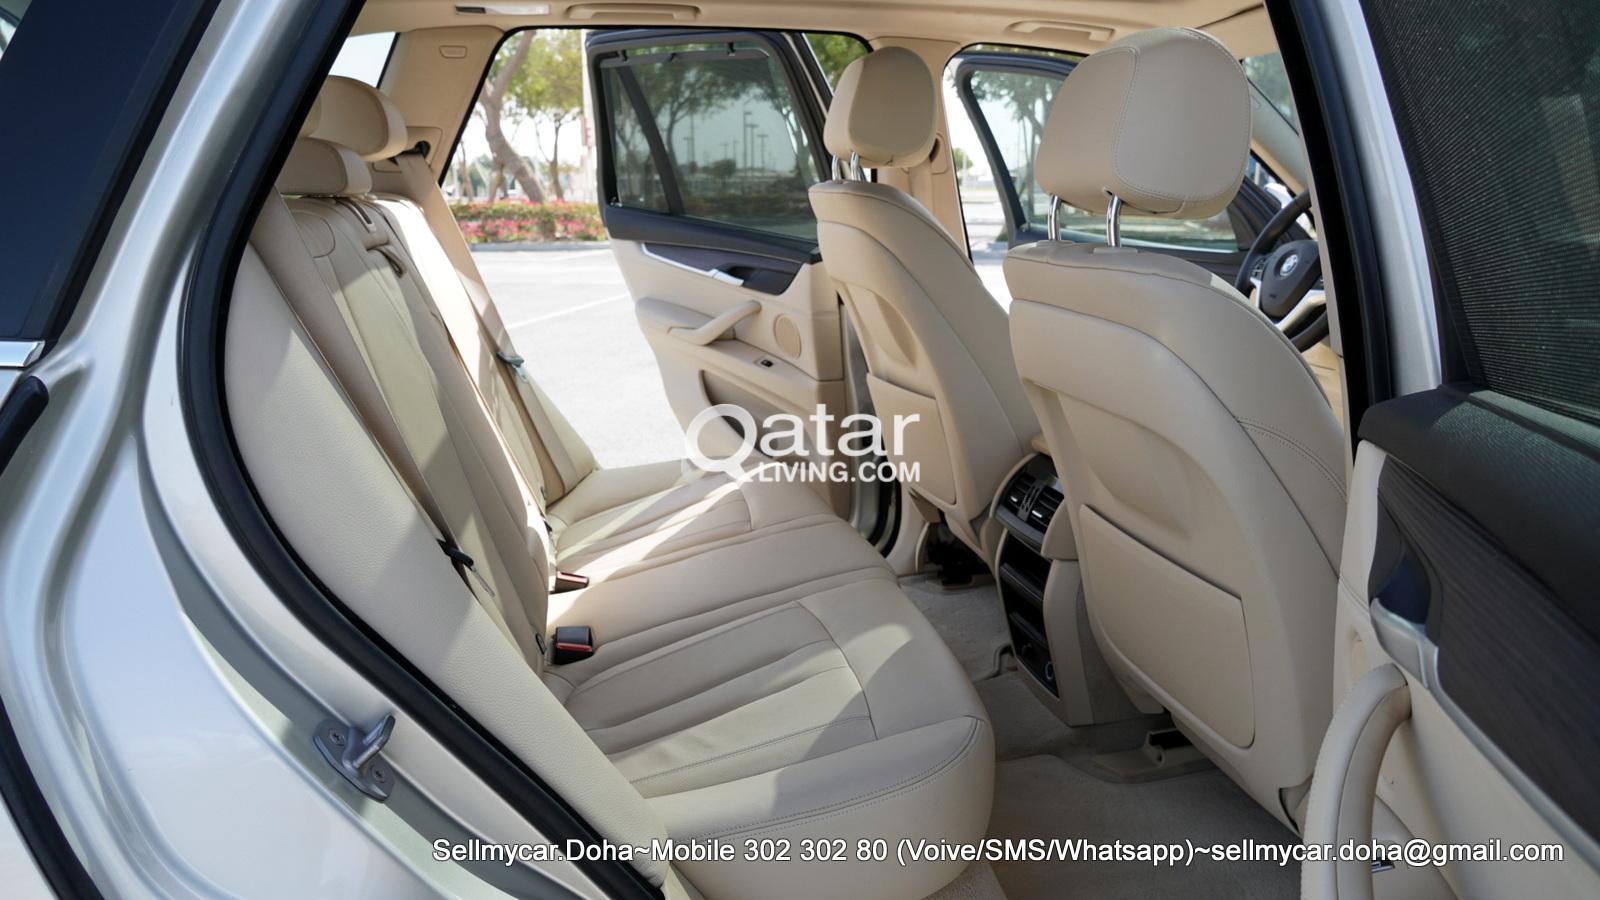 2014 BMW X5 3.5 X-Drive (Premium Package) Free BMW Service PKG until 2024